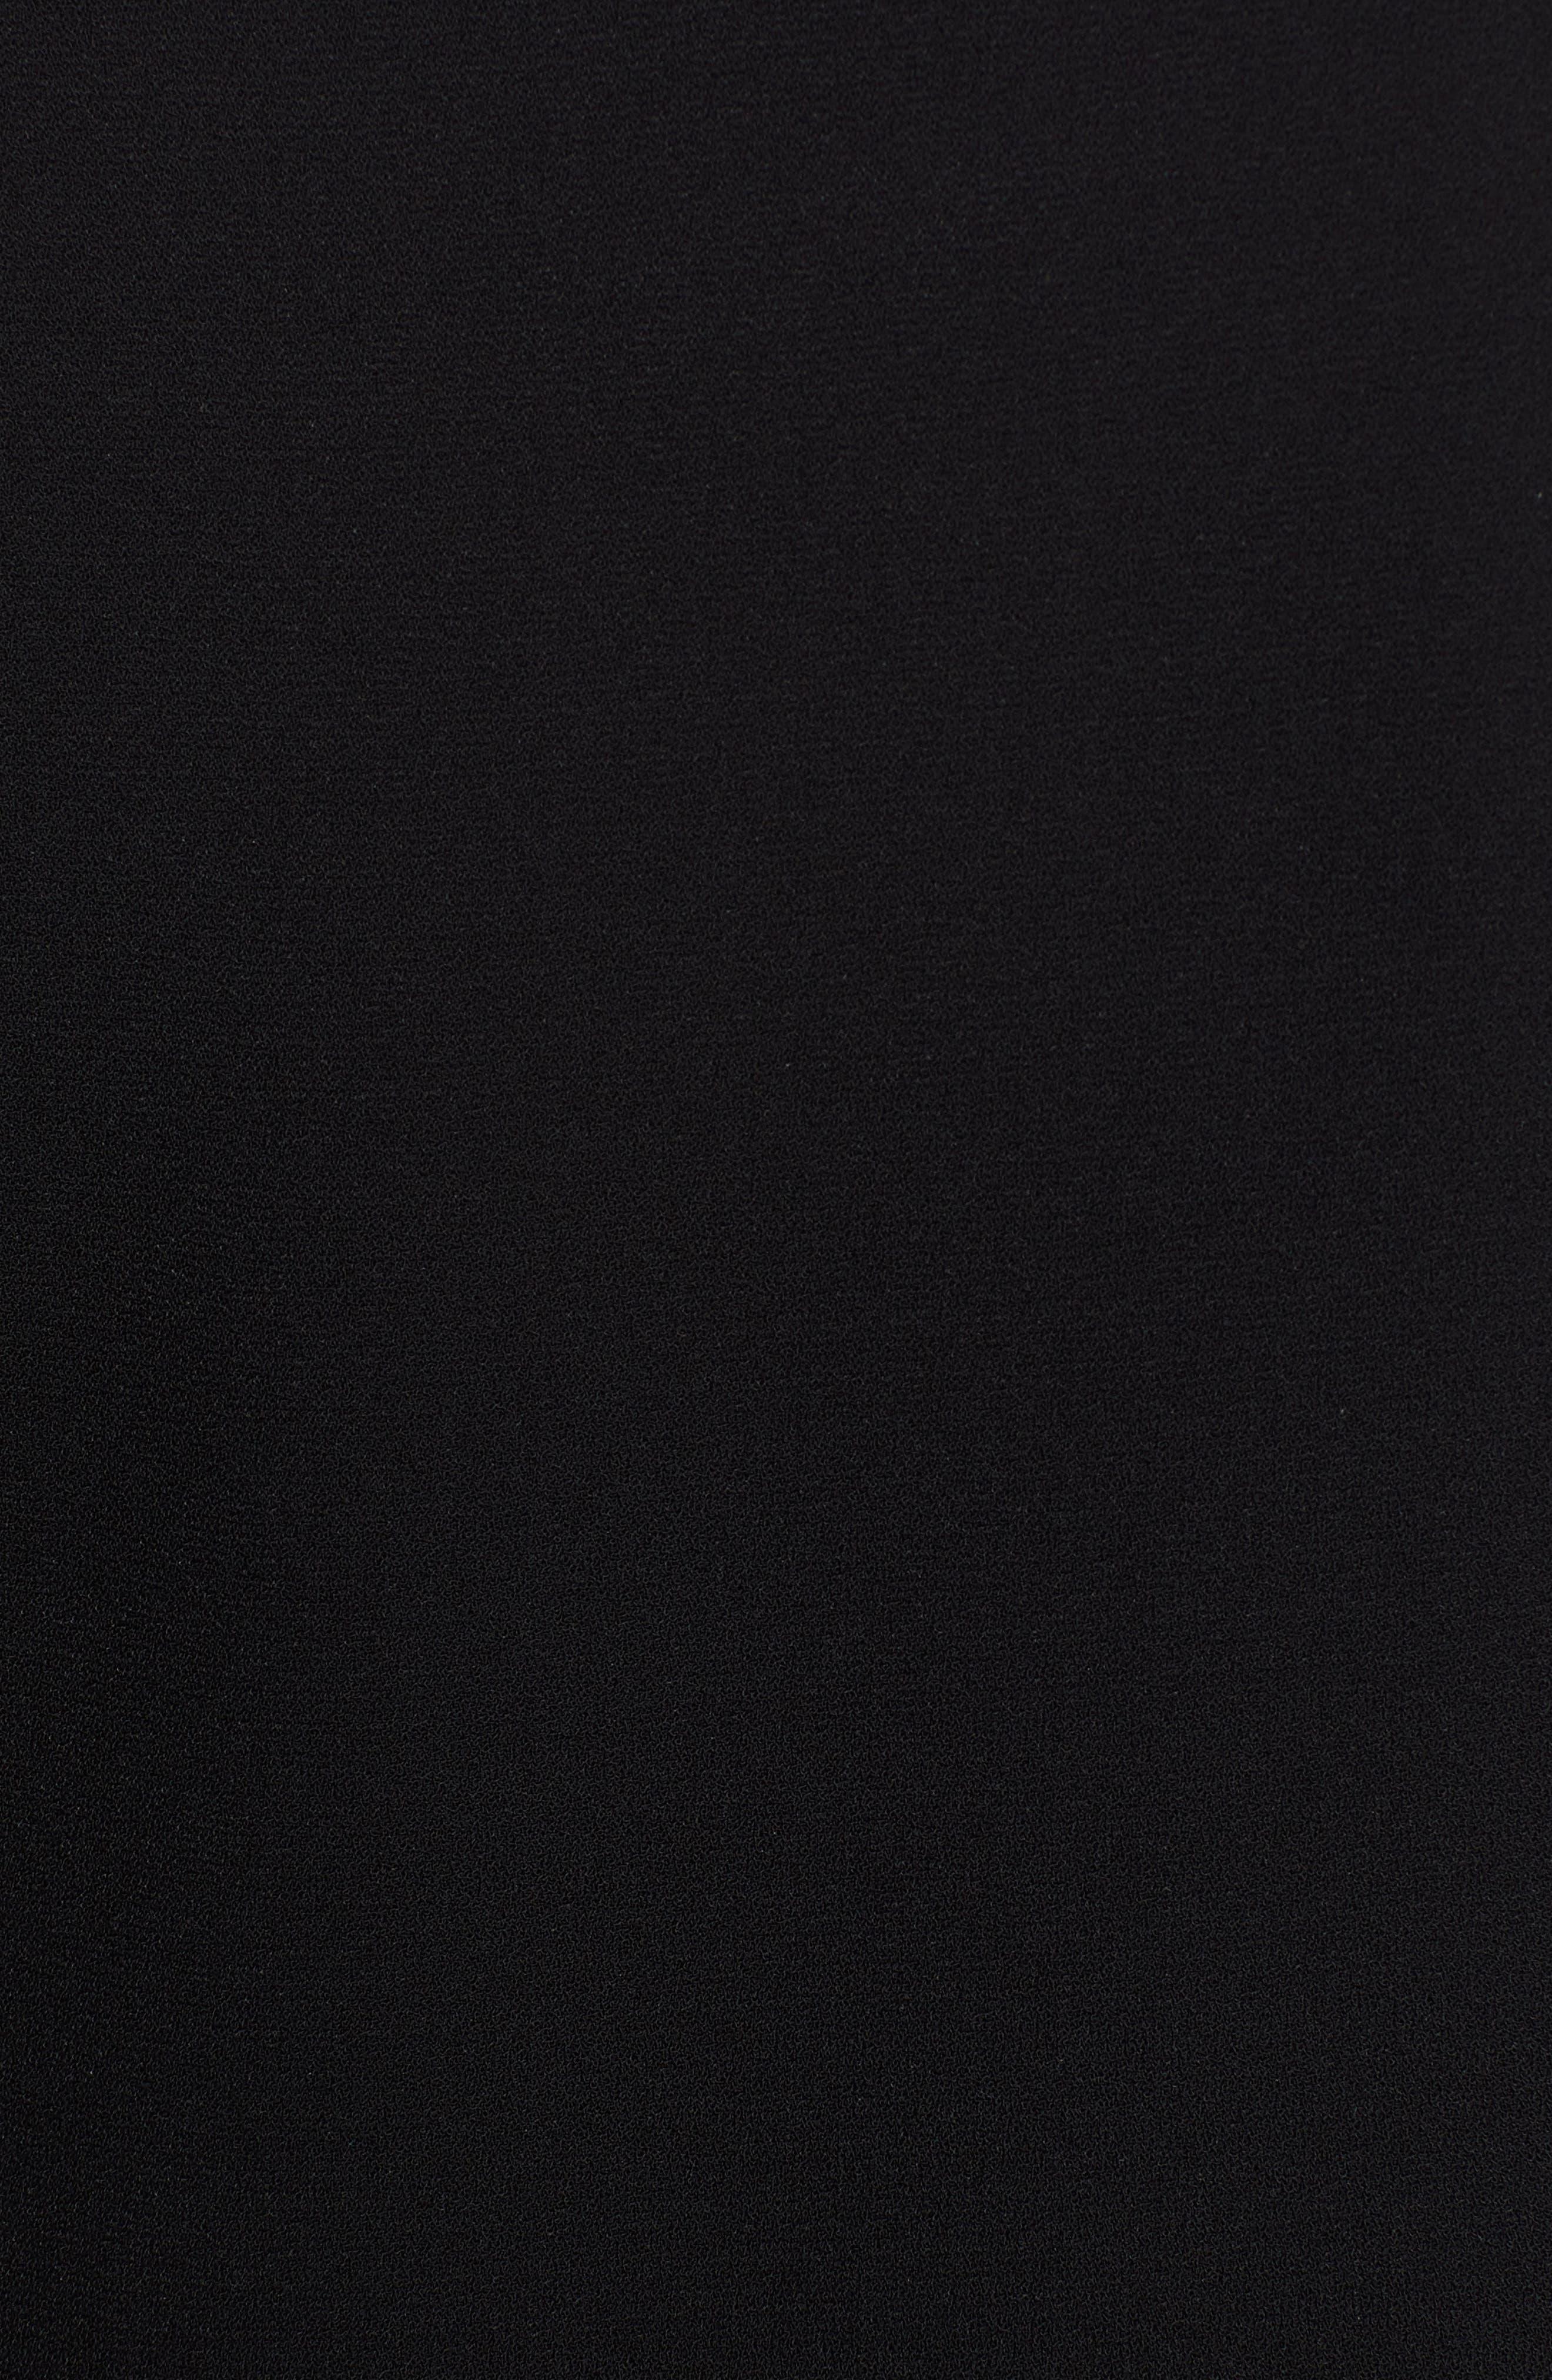 ANNE KLEIN, Scoop Neck Sleeveless Blouse, Alternate thumbnail 5, color, ANNE BLACK